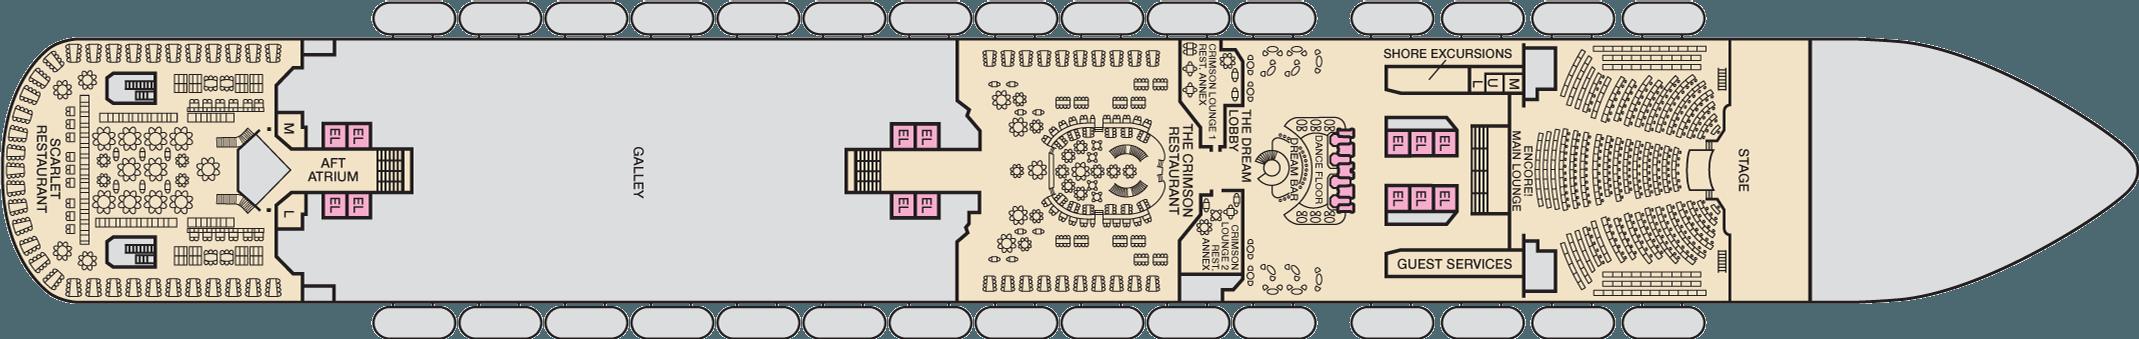 Deck 3 Lobby